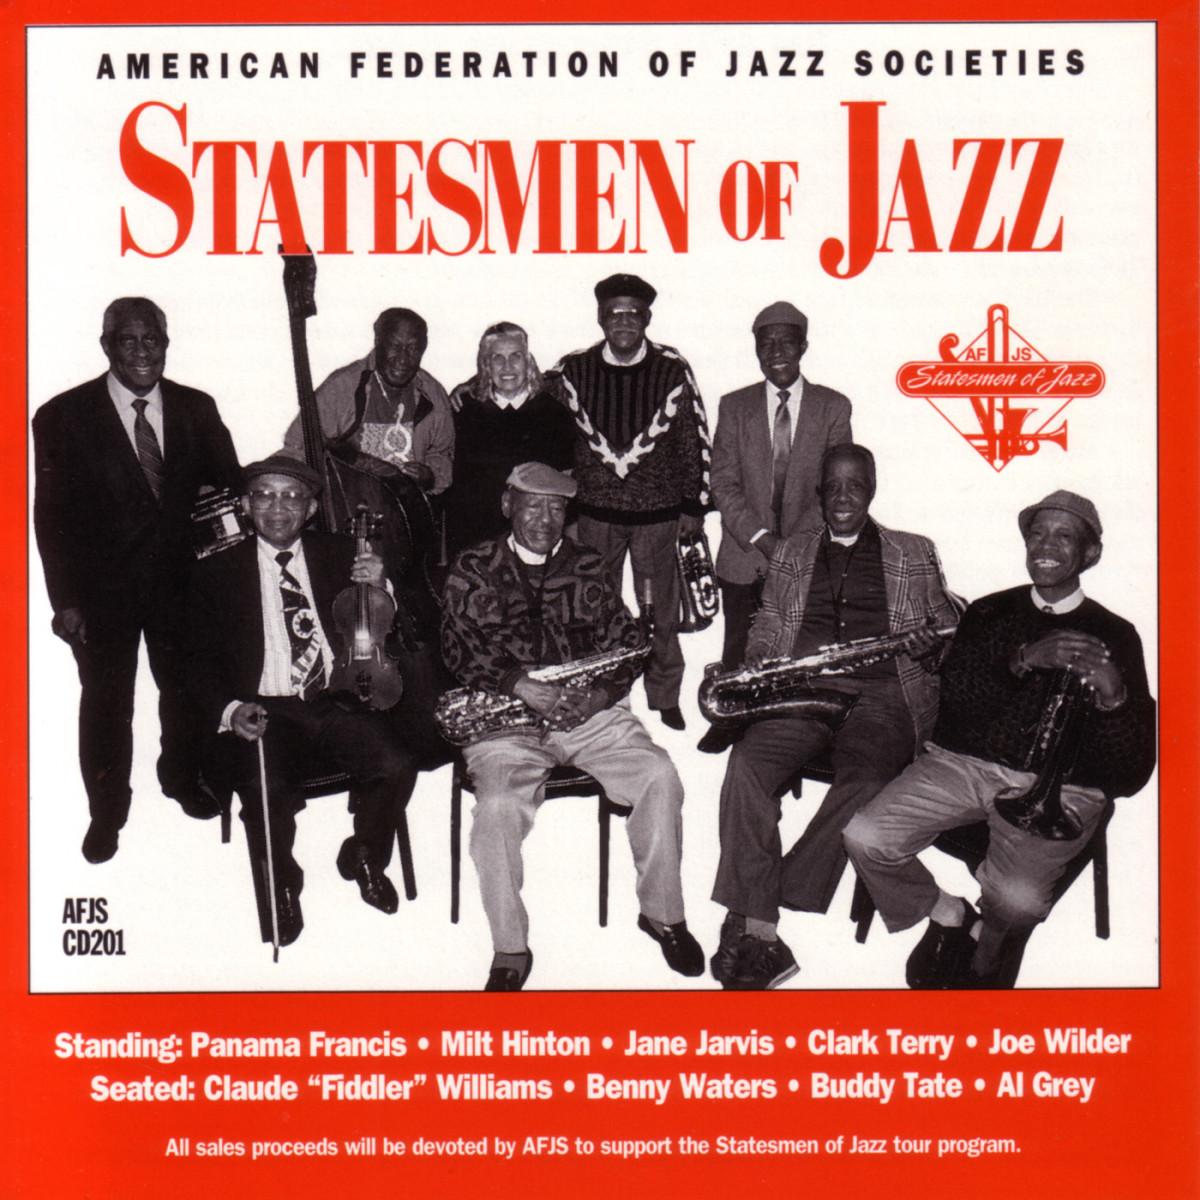 Al Grey and the Statesmen Of Jazz